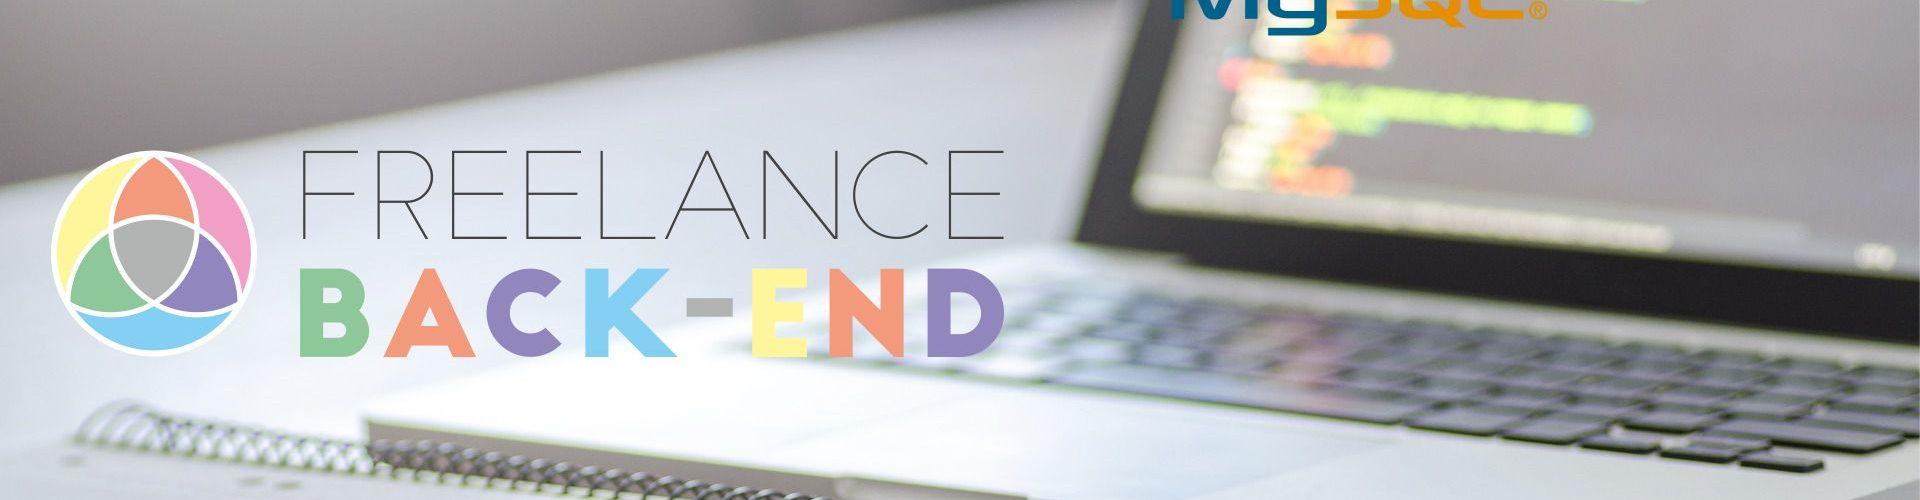 freelance back end programador